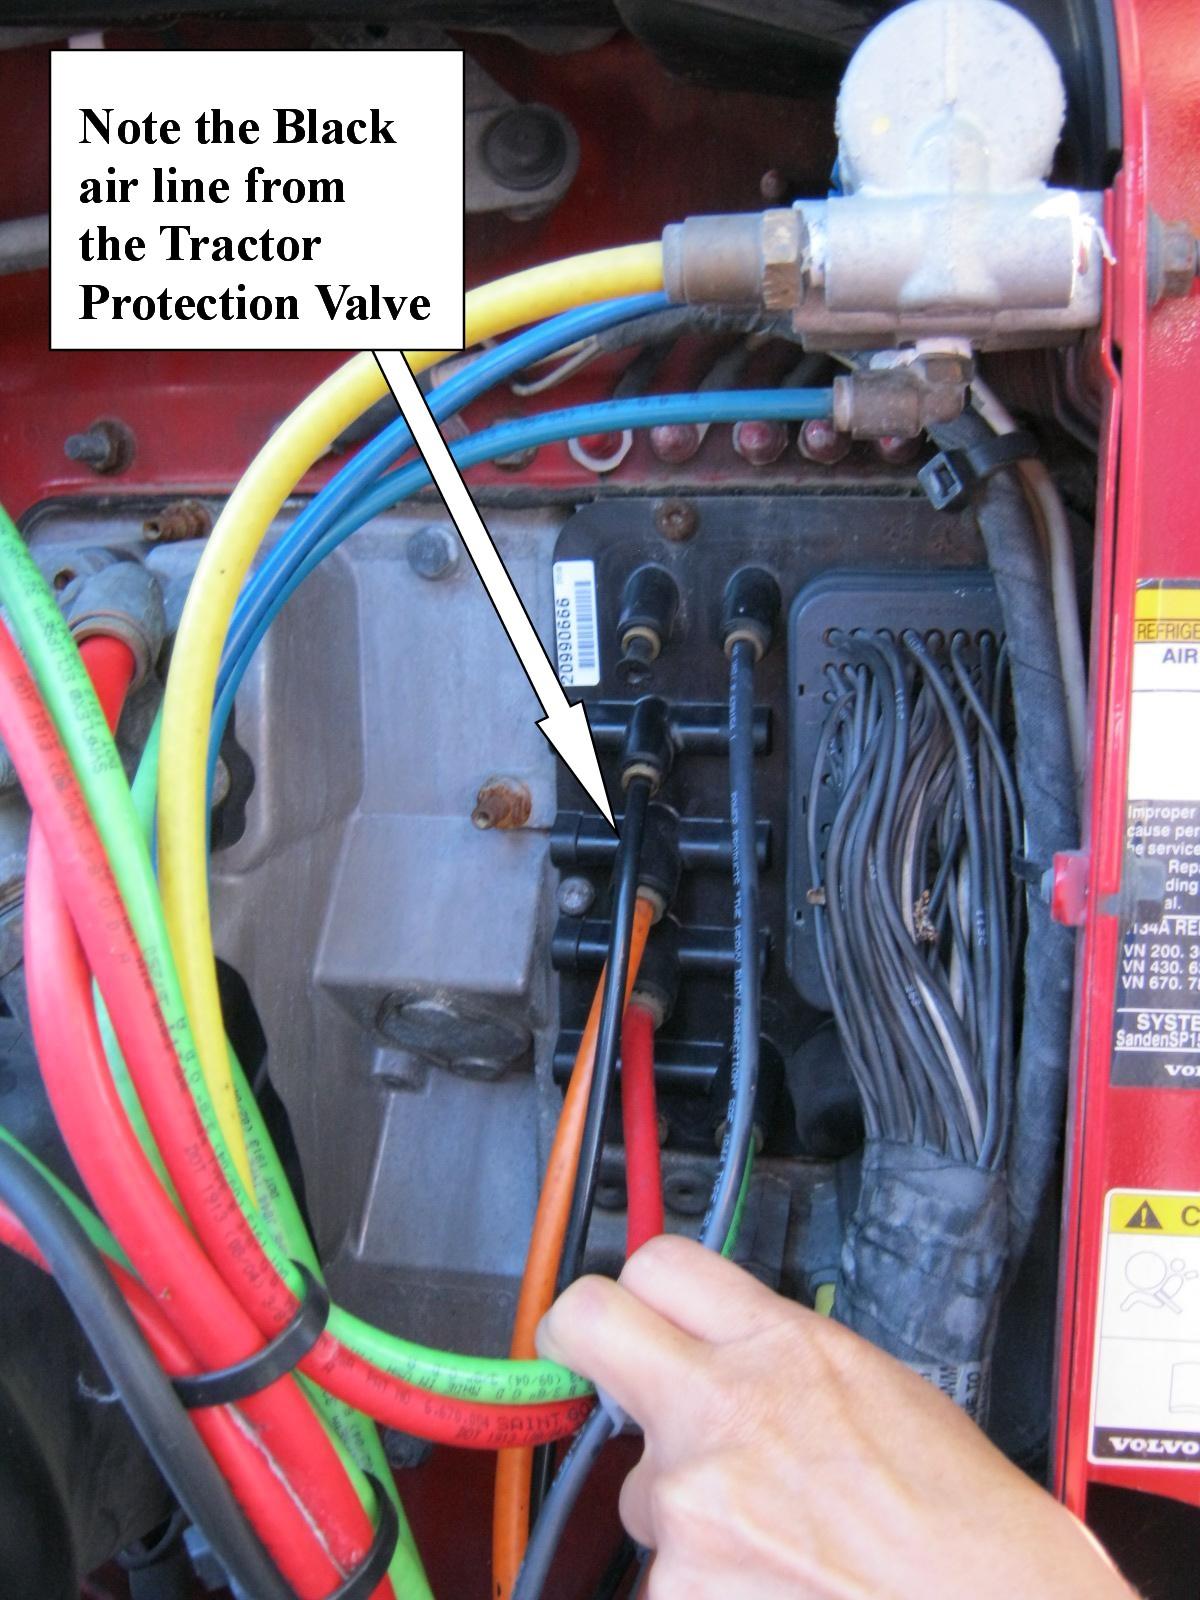 Semi Trailer Wiring Harness Diagram Hayes Brakesmart Maxbrake Controllers Heavy Haulers Rv